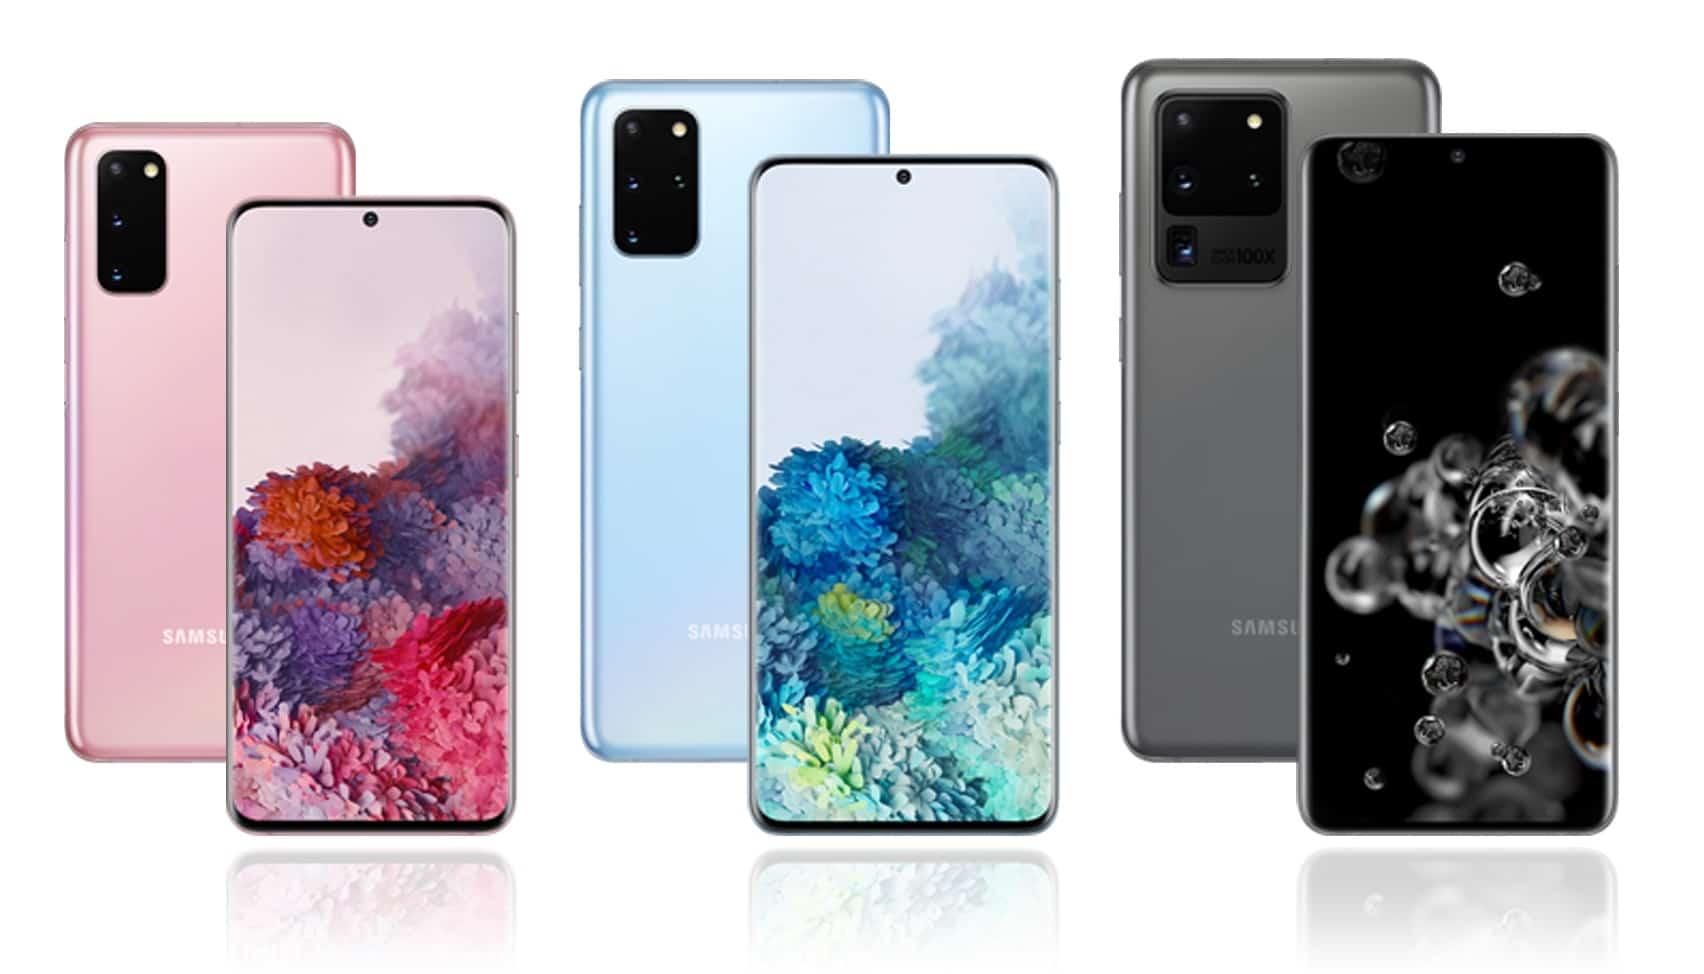 Samsung Galaxy S20, S20+, S20 Ultra